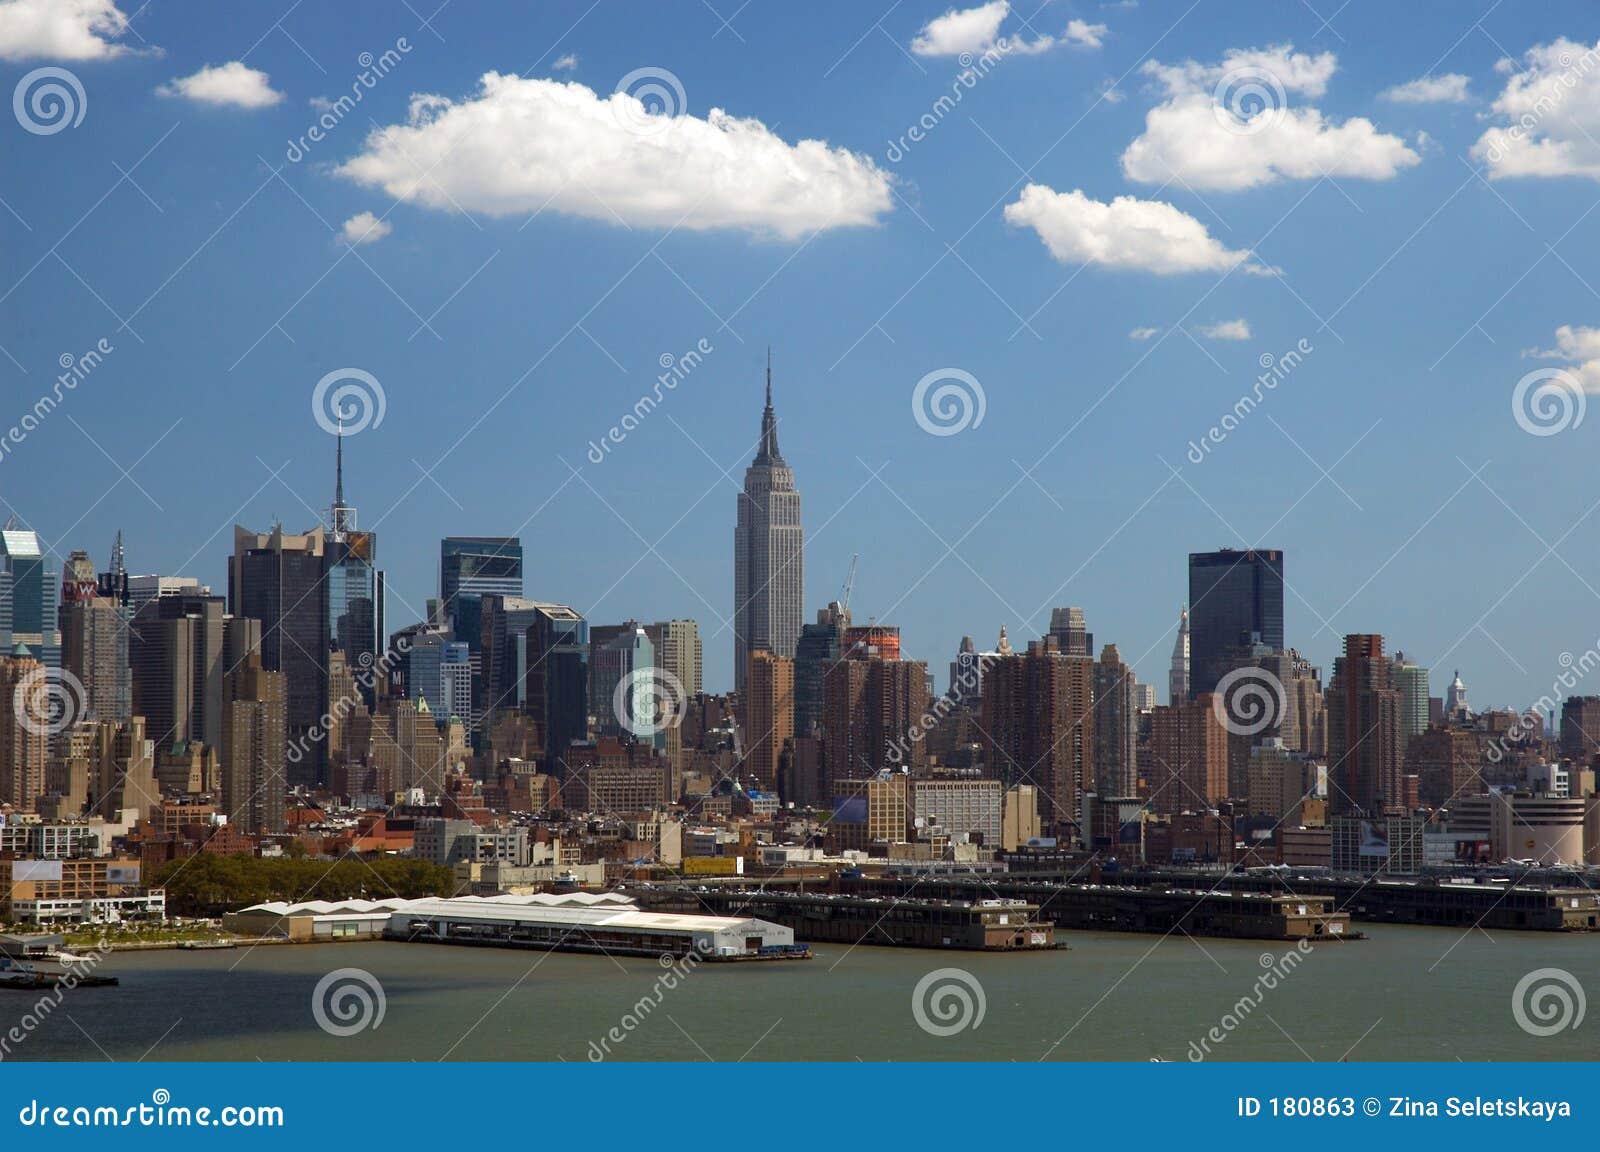 new york skyline stock photos image 180863. Black Bedroom Furniture Sets. Home Design Ideas